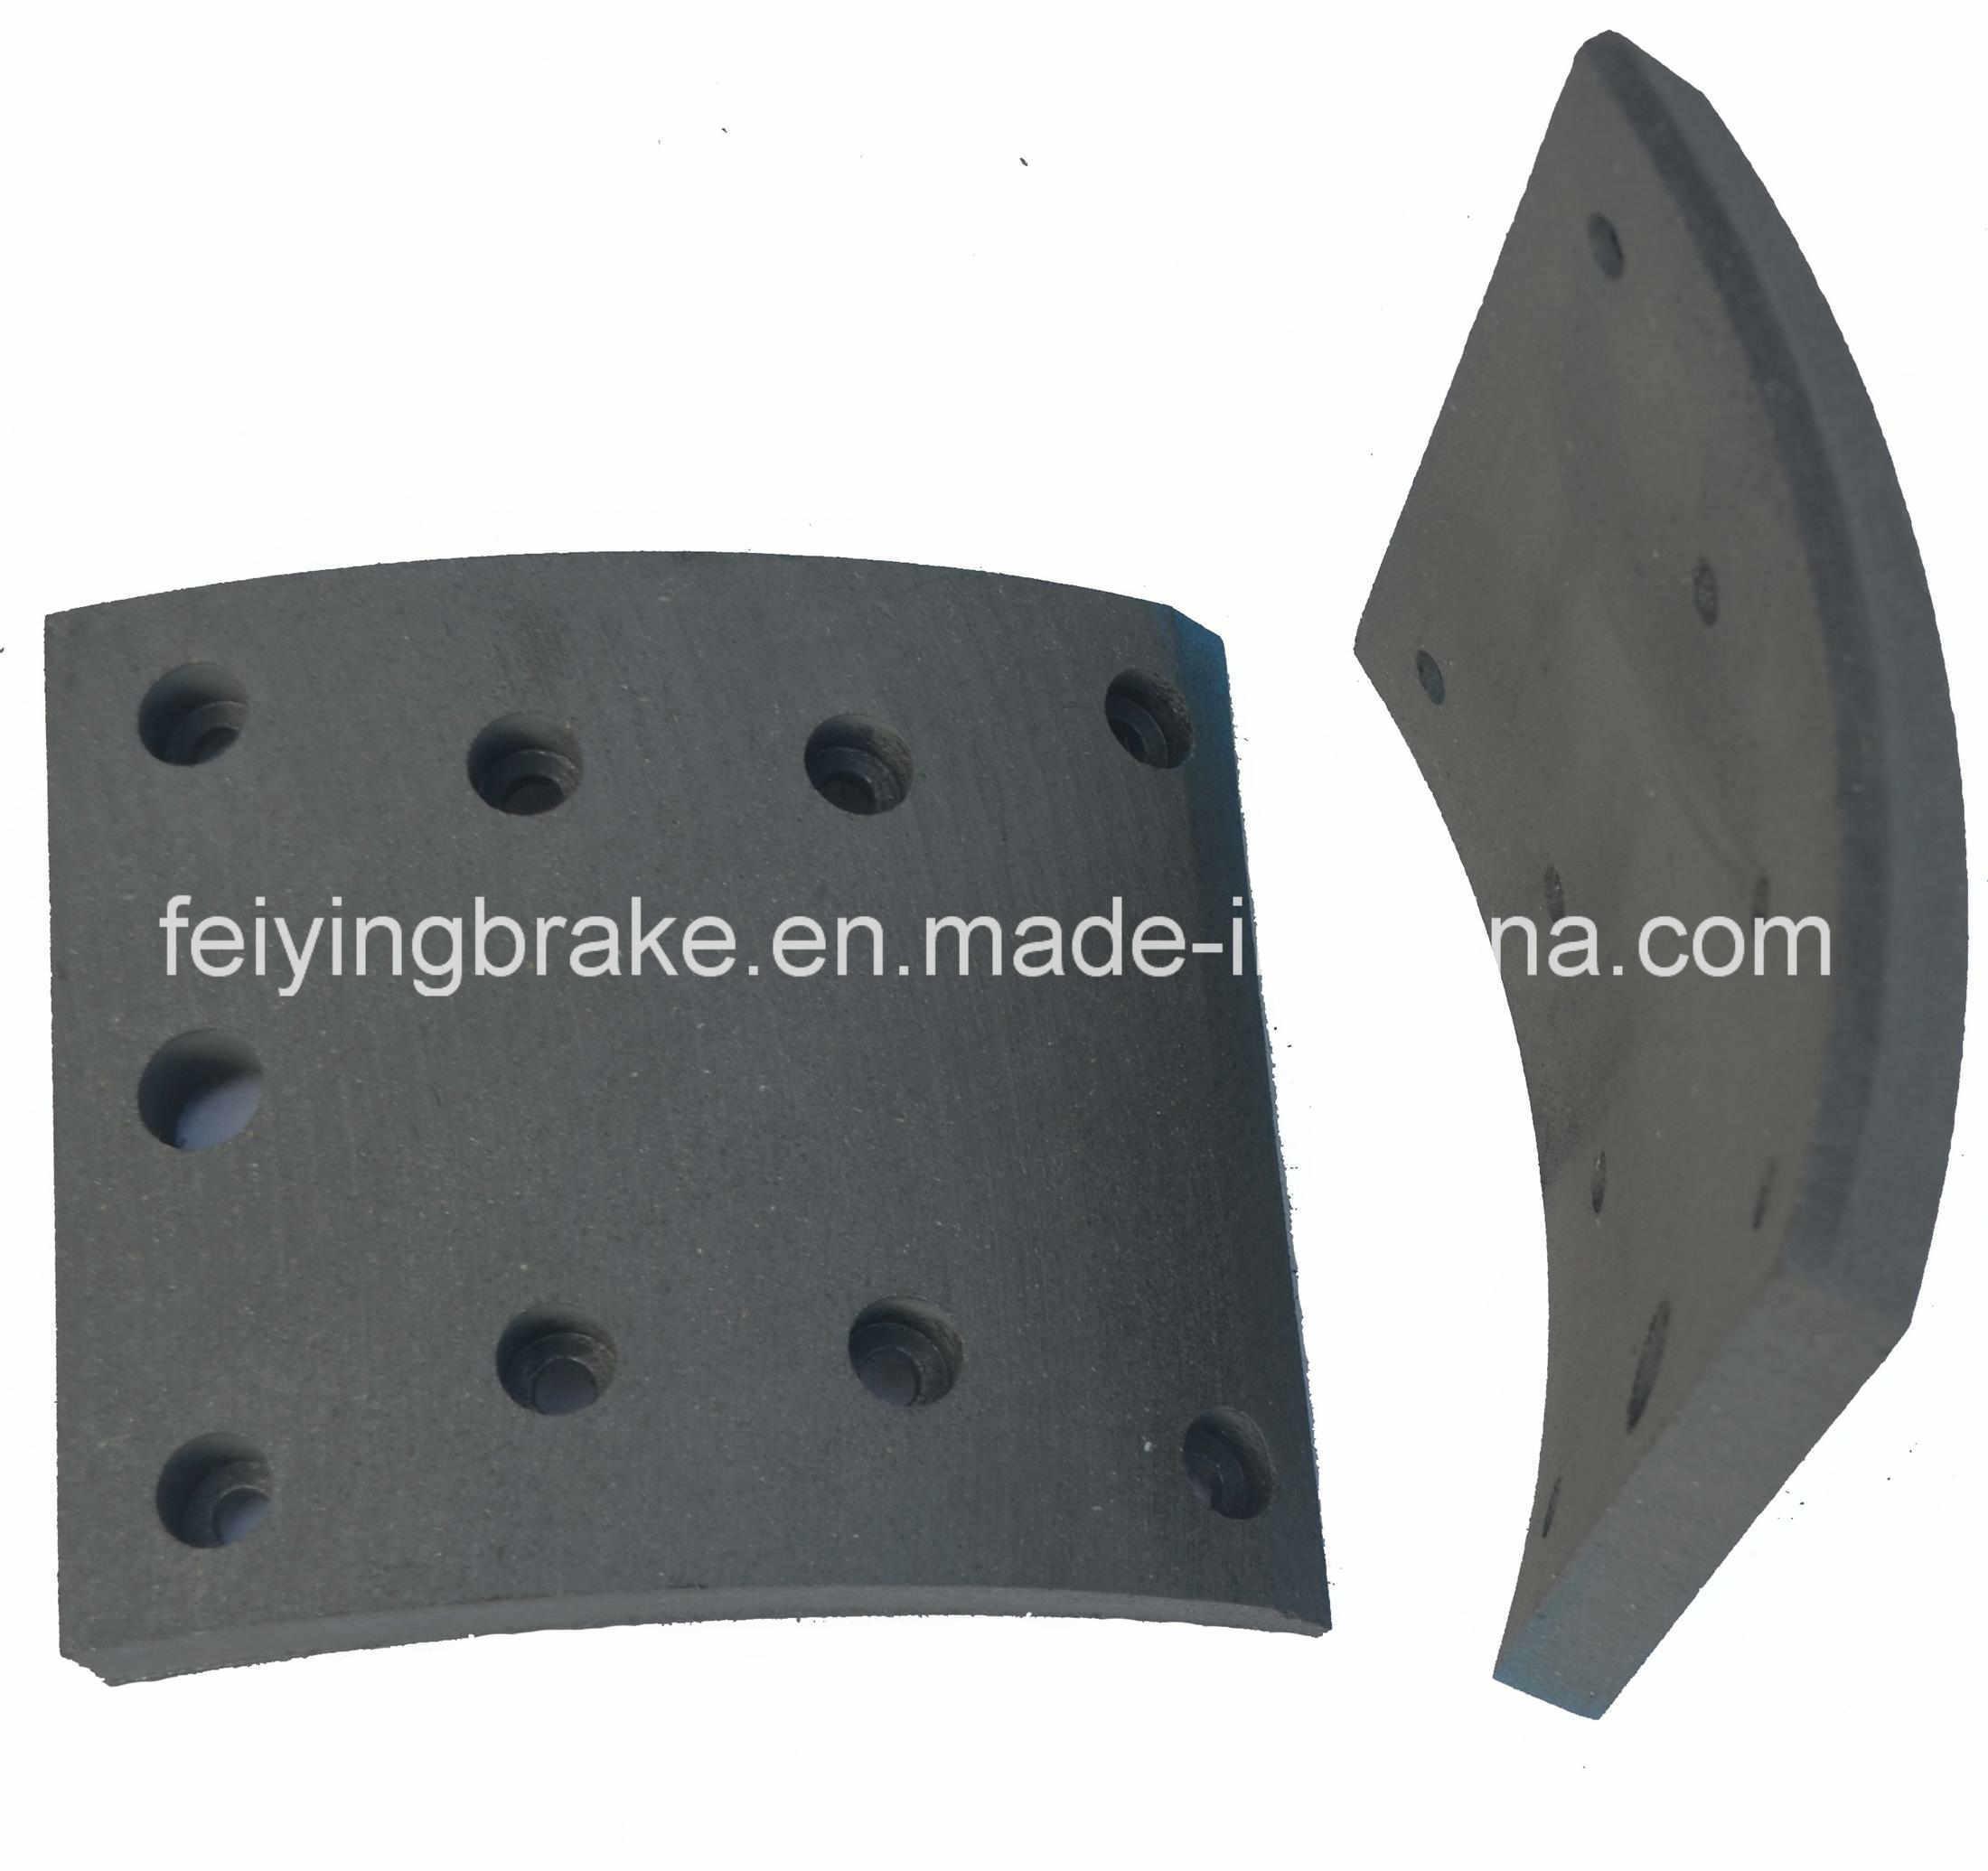 Truck Brake Lining (WVA: 19494 BFMC: MP/31/2)